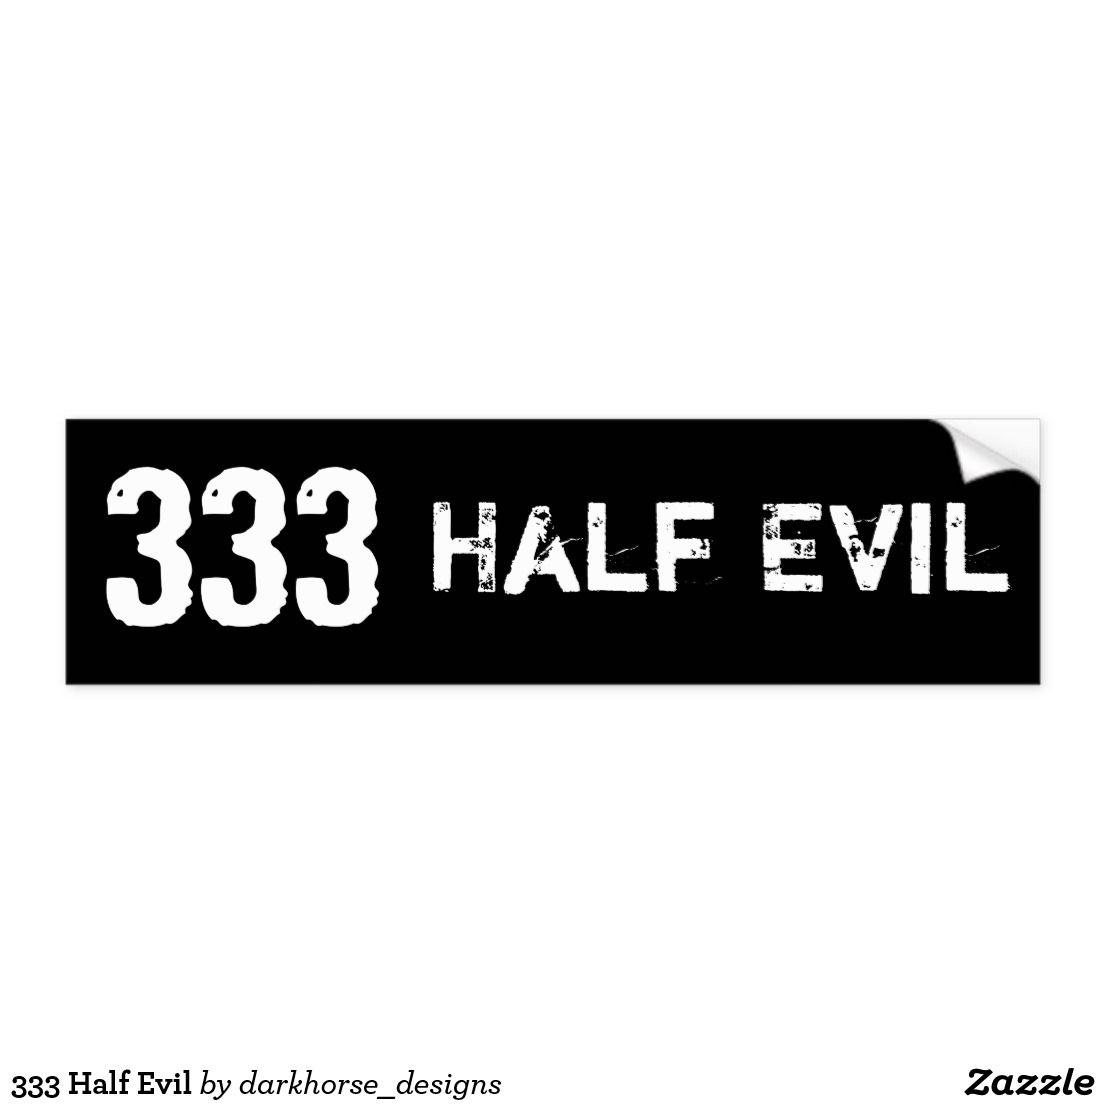 333 Half Evil Bumper Sticker   Zazzle.com in 2021   Bumper ...